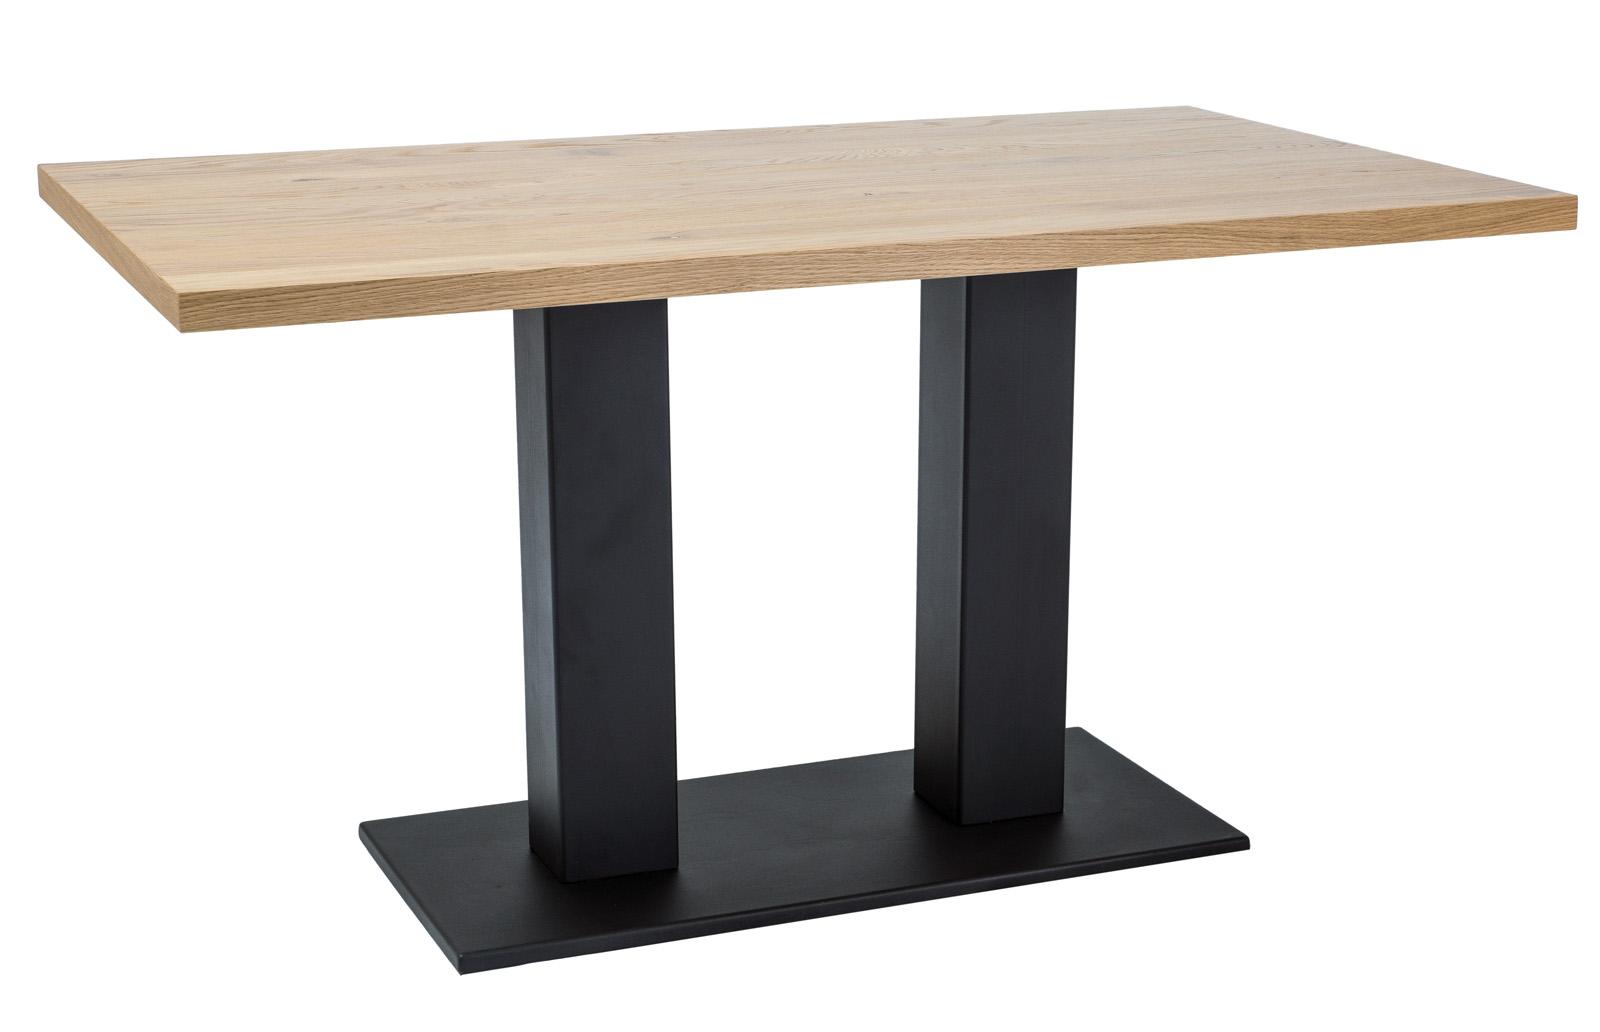 Masa din metal si lemn de stejar Sauron Dab, L180xl90xh78 cm imagine